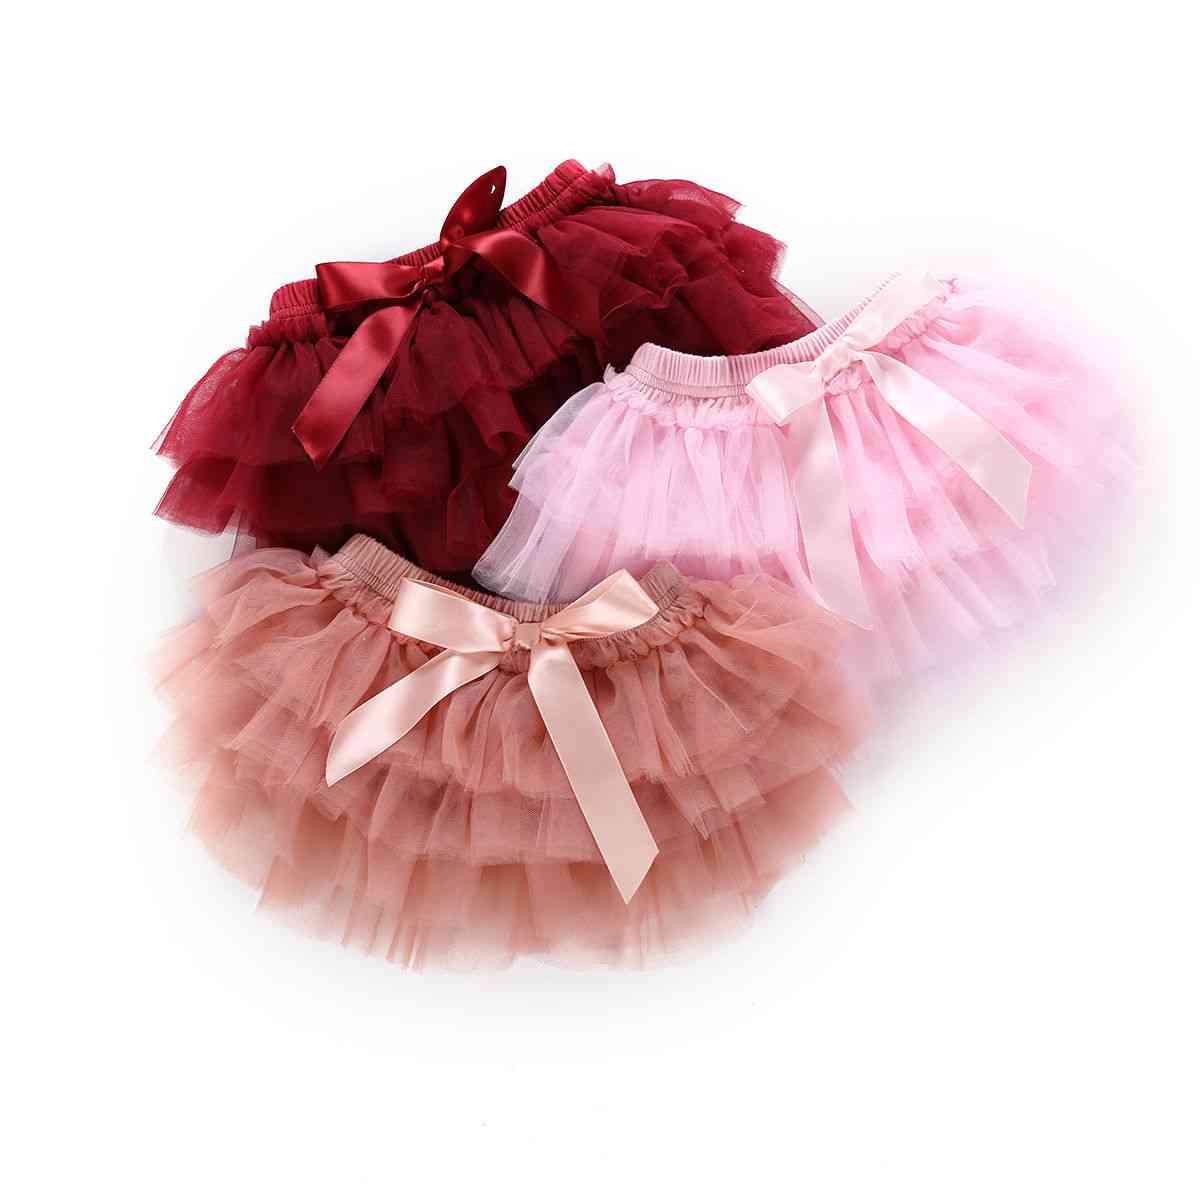 Baby Layer Ballet Dance Pettiskirt, Tutu Skirt Photo Props